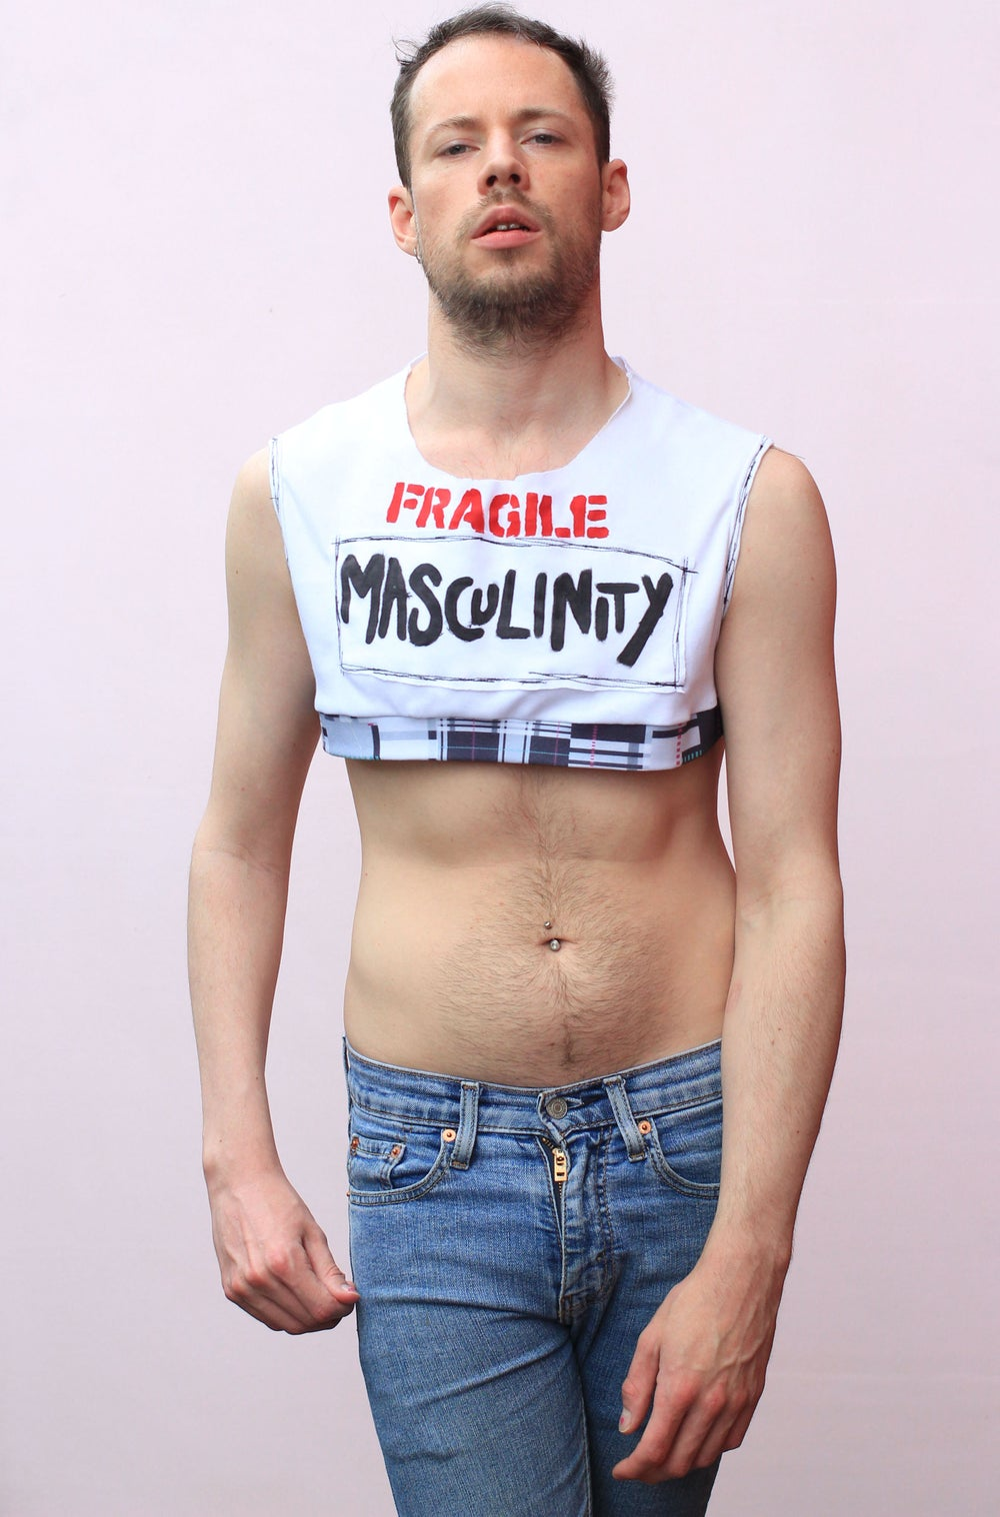 FRAGILE MASCULINITY CROP TOP